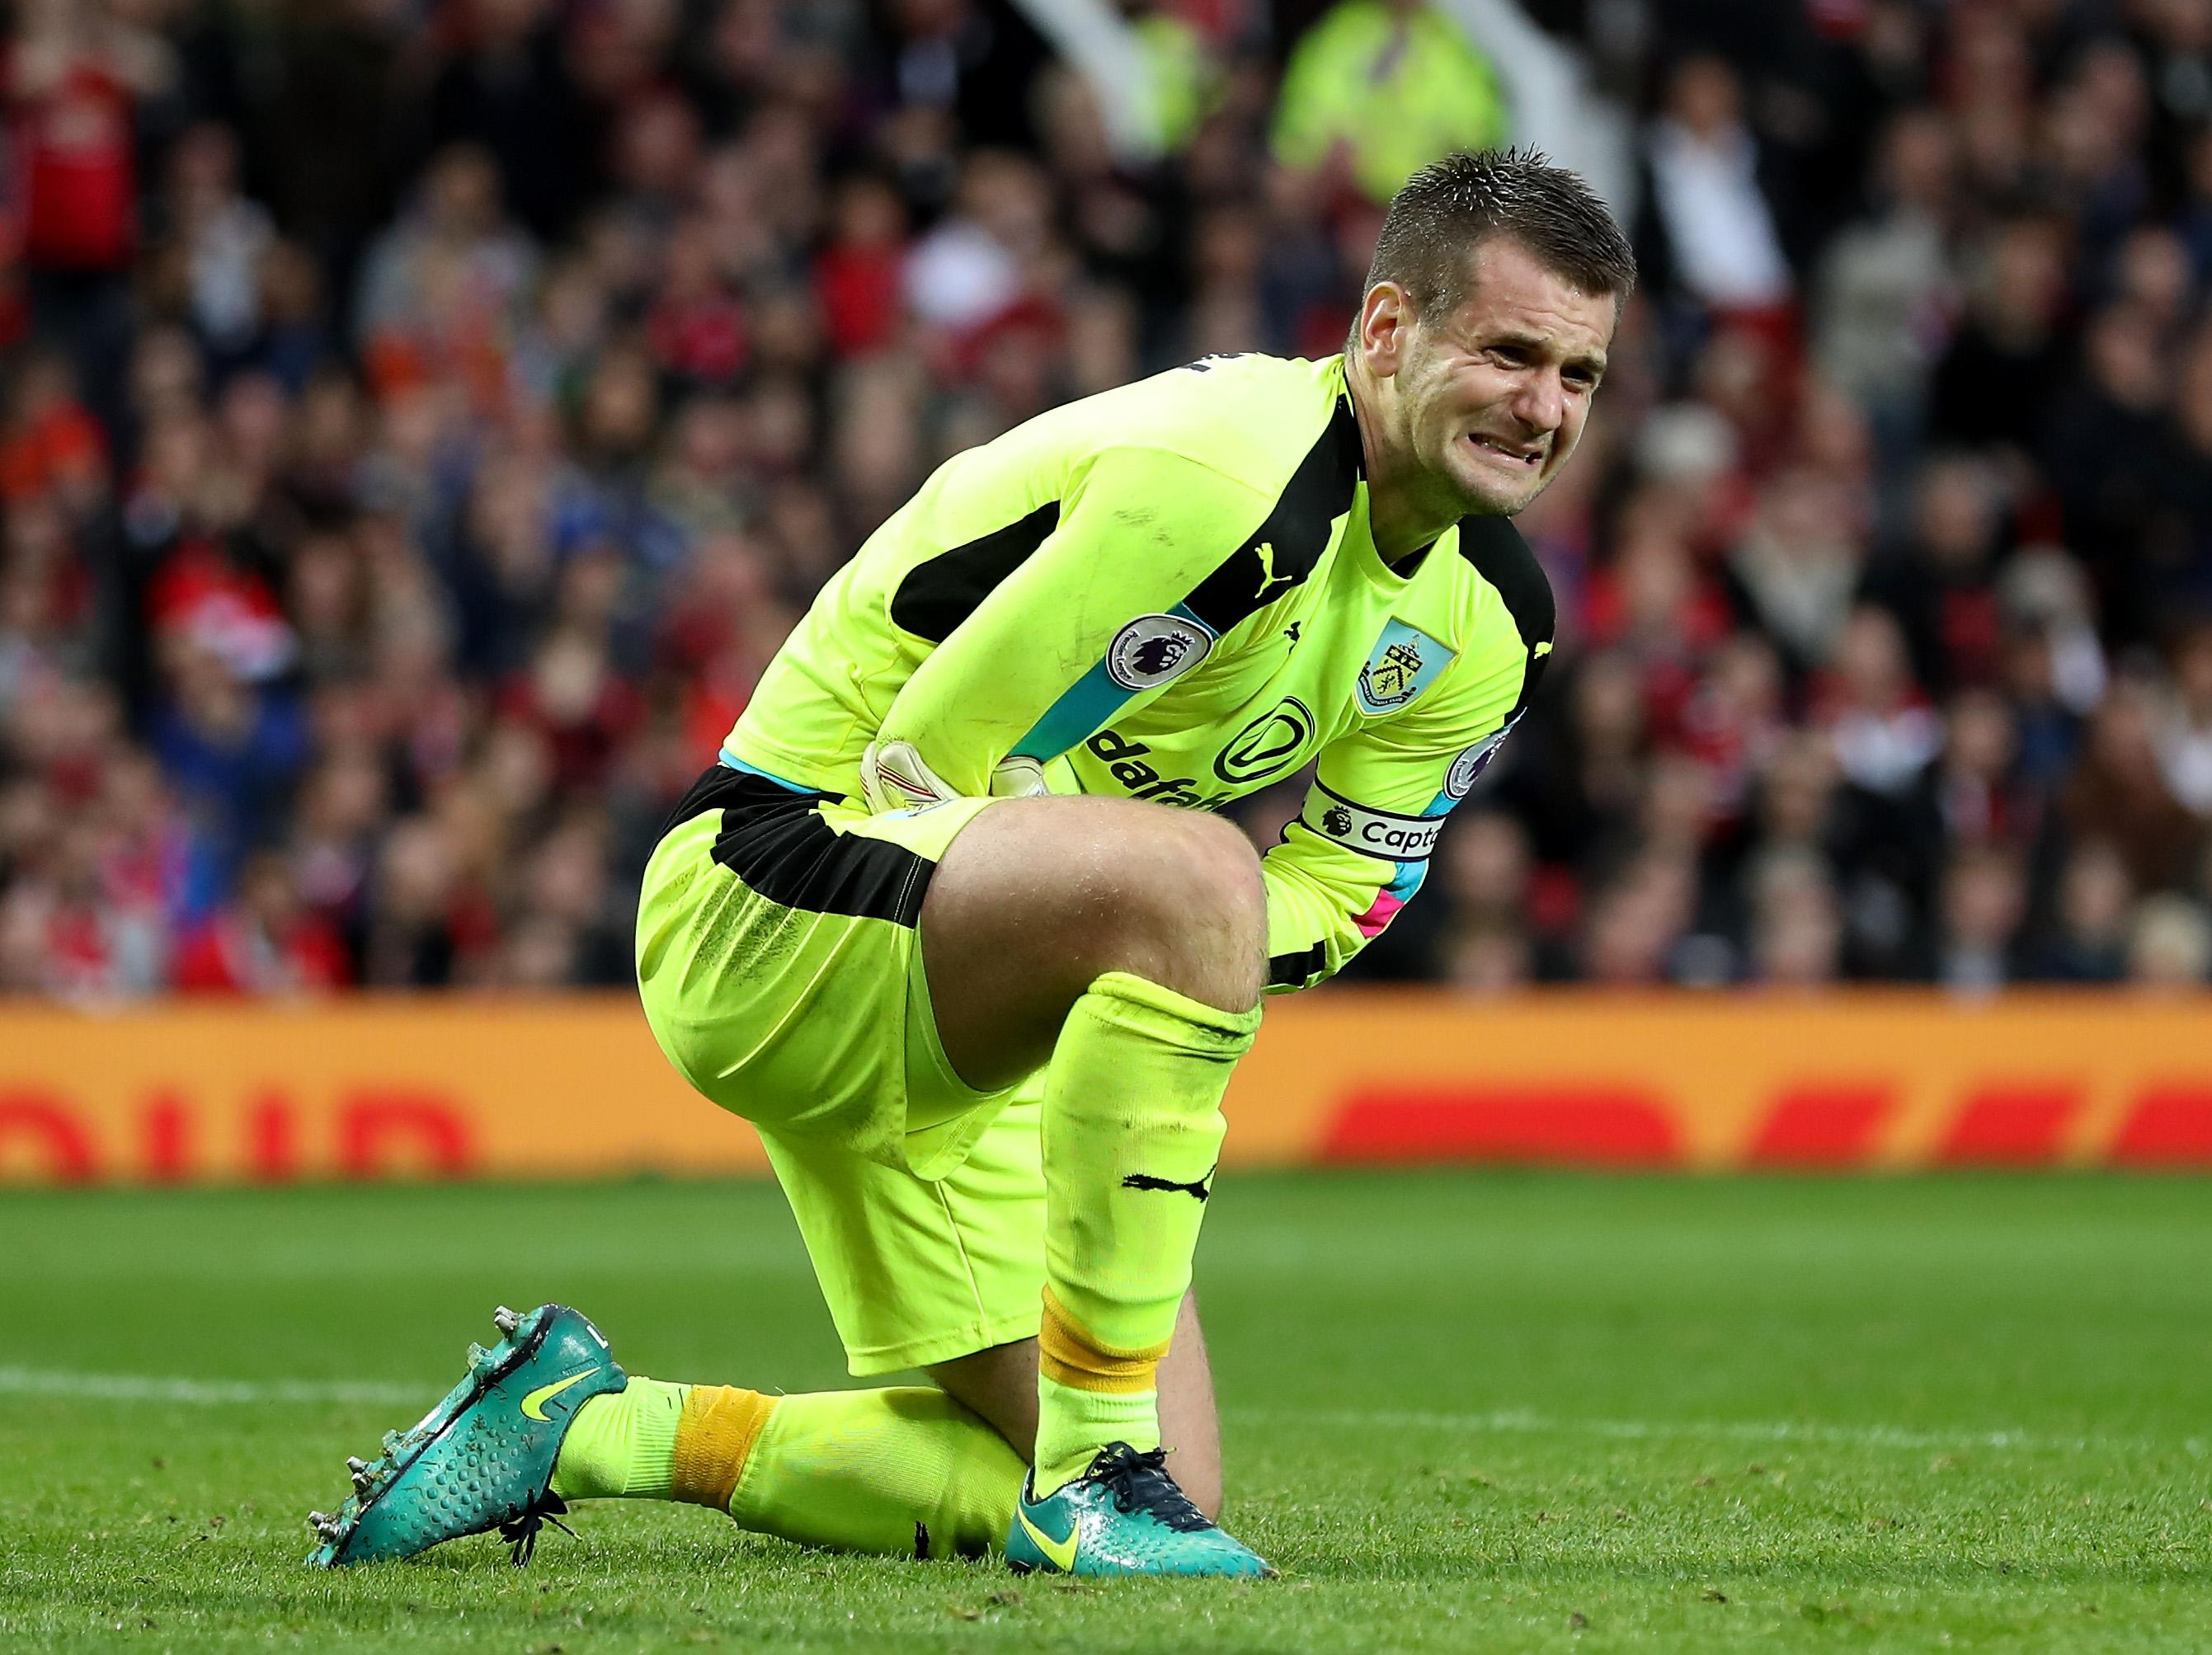 Zlatan Ibrahimovic nearly broke my arm, says Burnley hero Tom Heaton